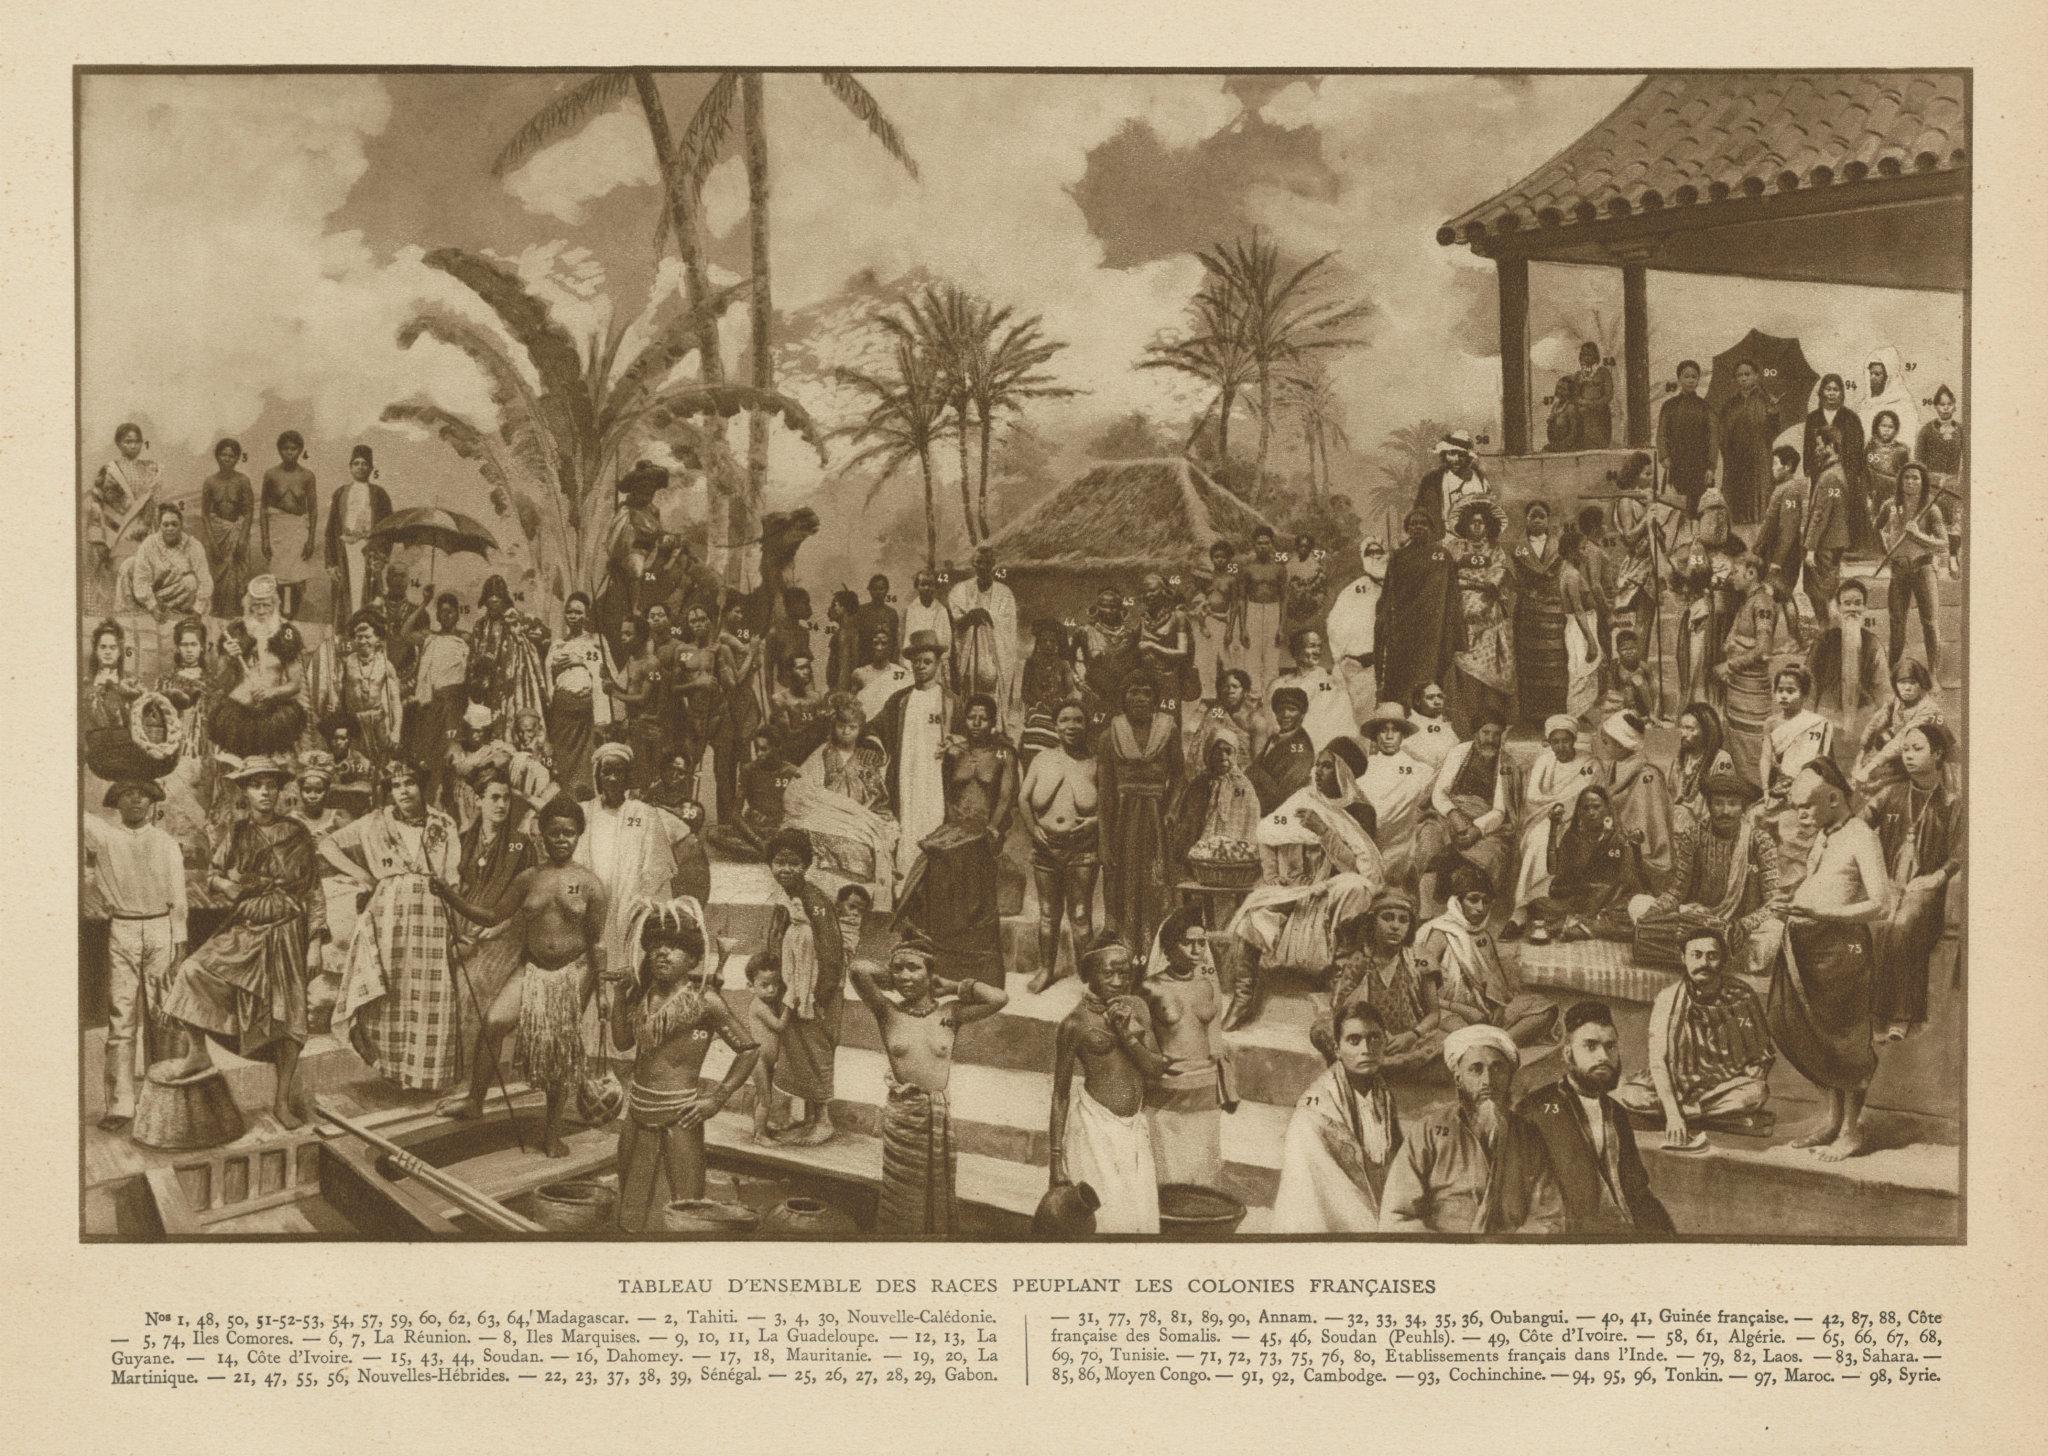 Associate Product Tableau des races des colonies Francaises. People of the French colonies 1929